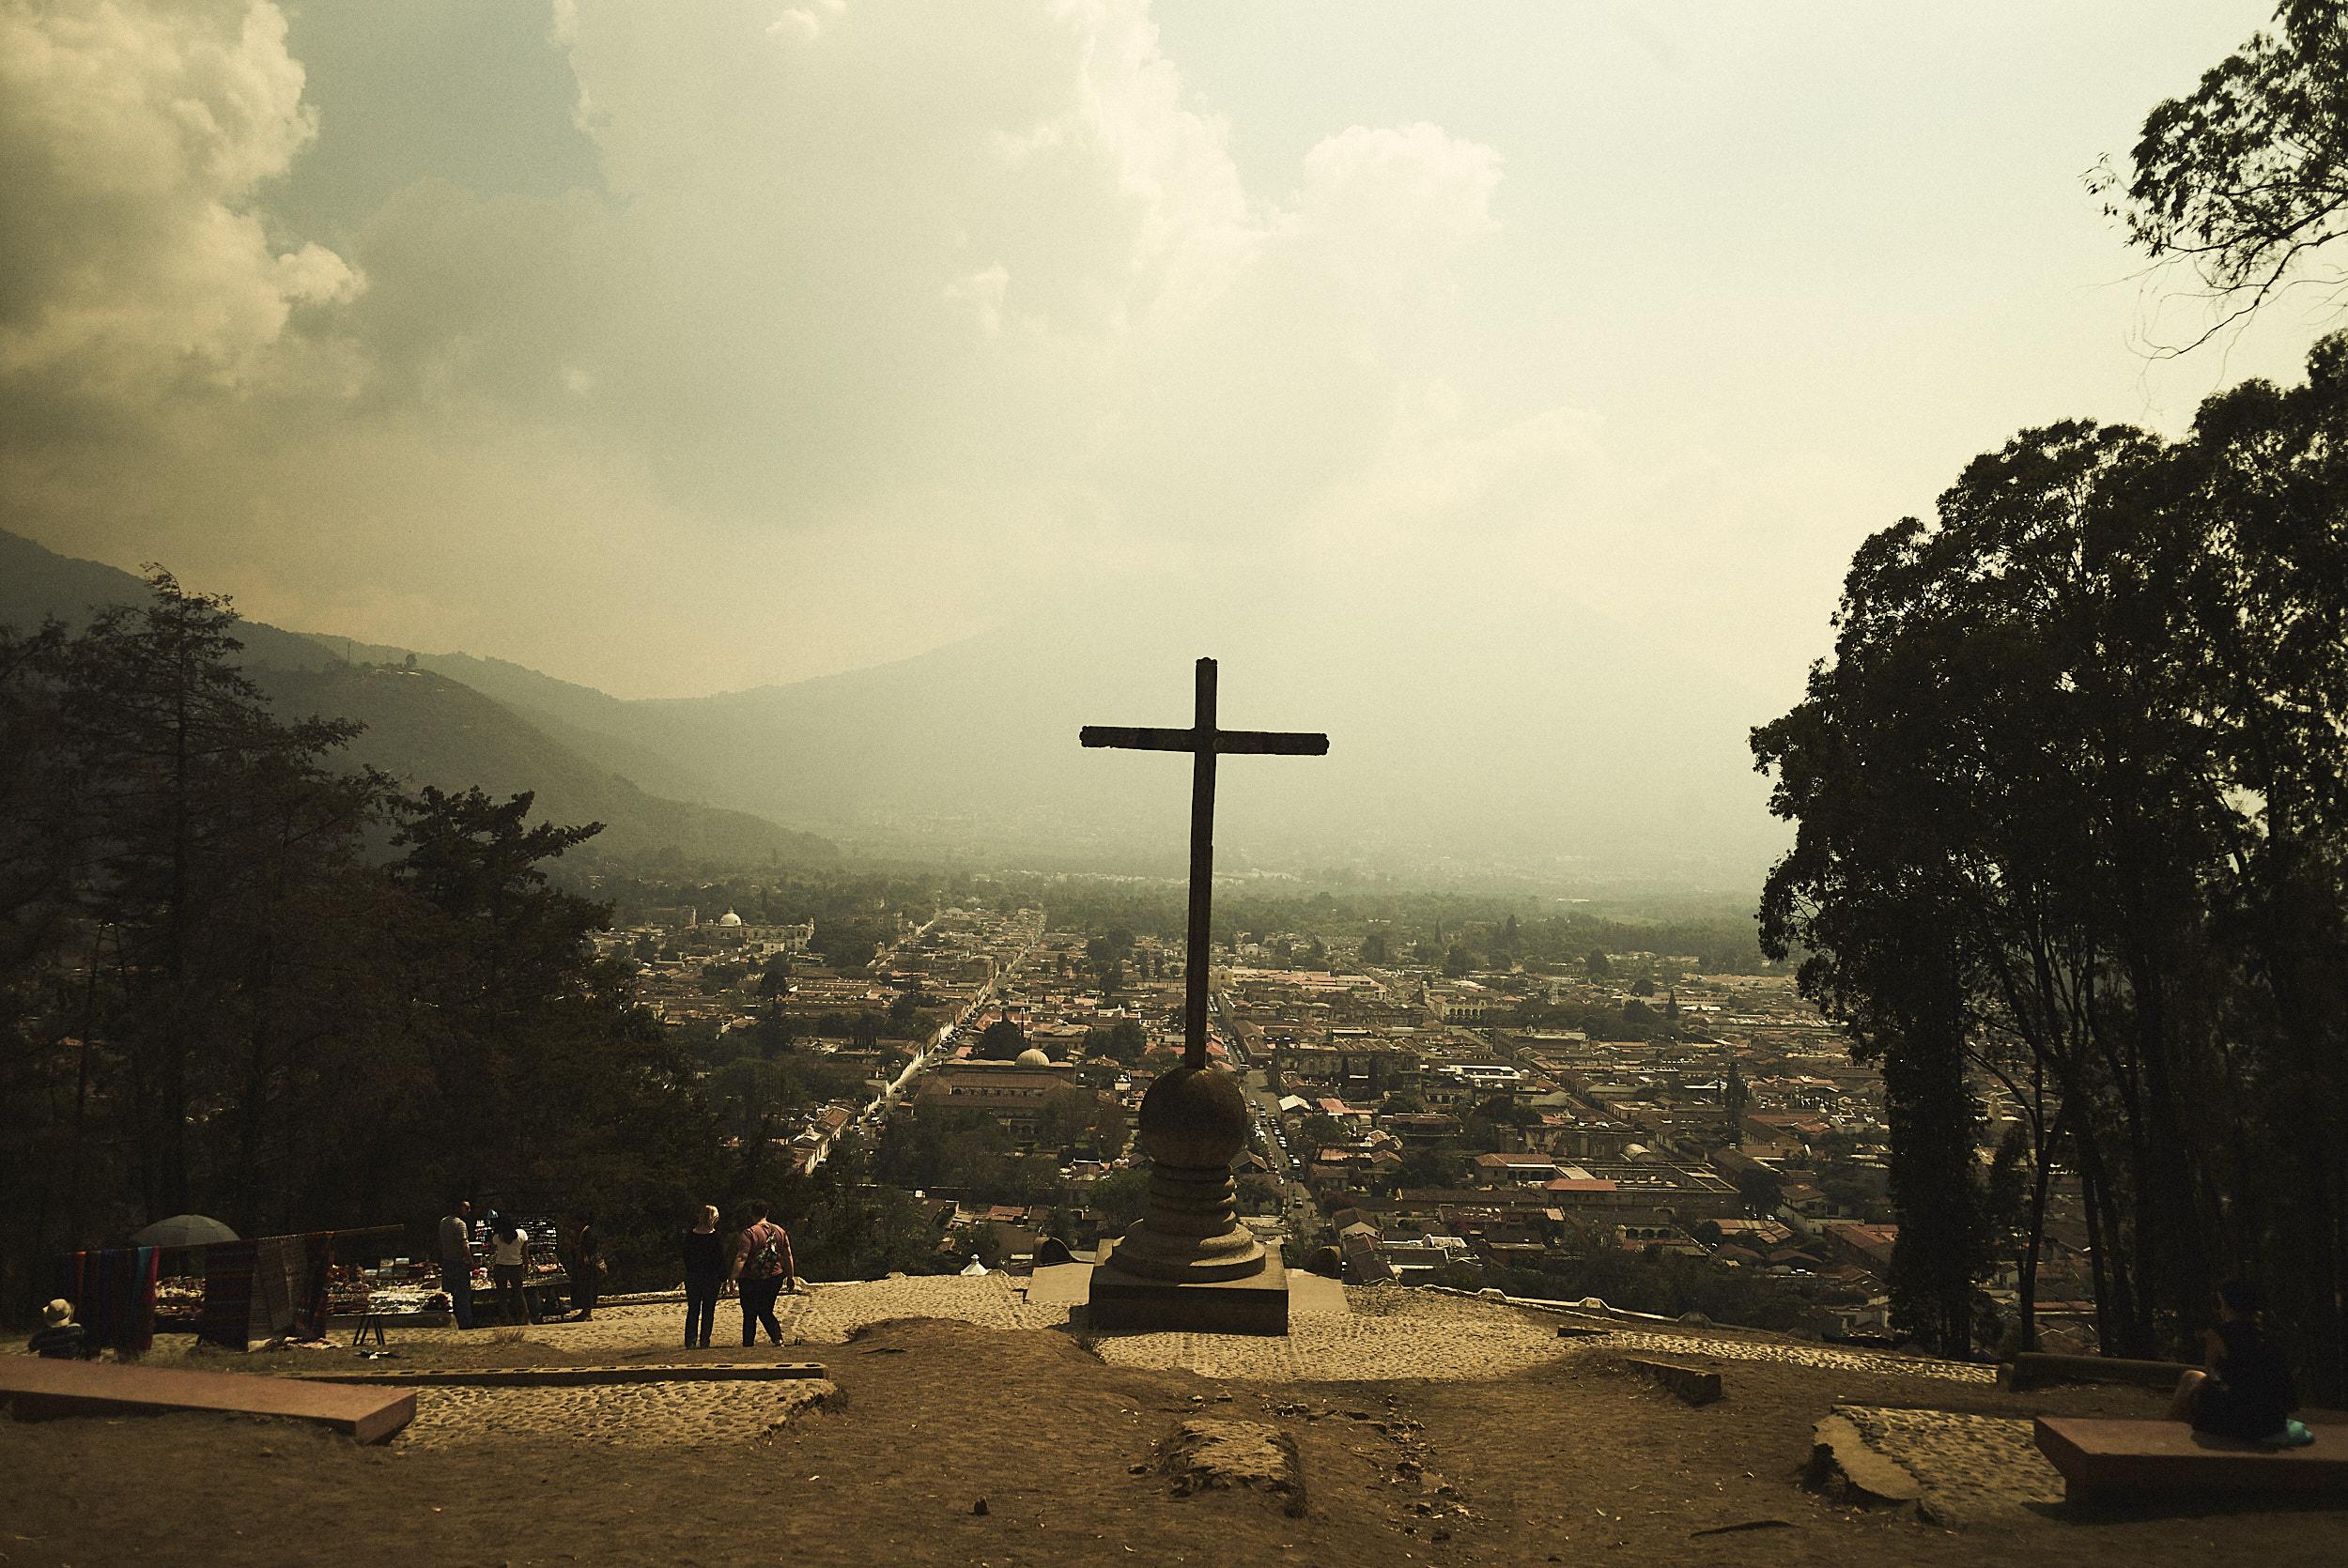 LOWRES-NYC-ELSALVADOR-GUATEMALA-1495.jpg